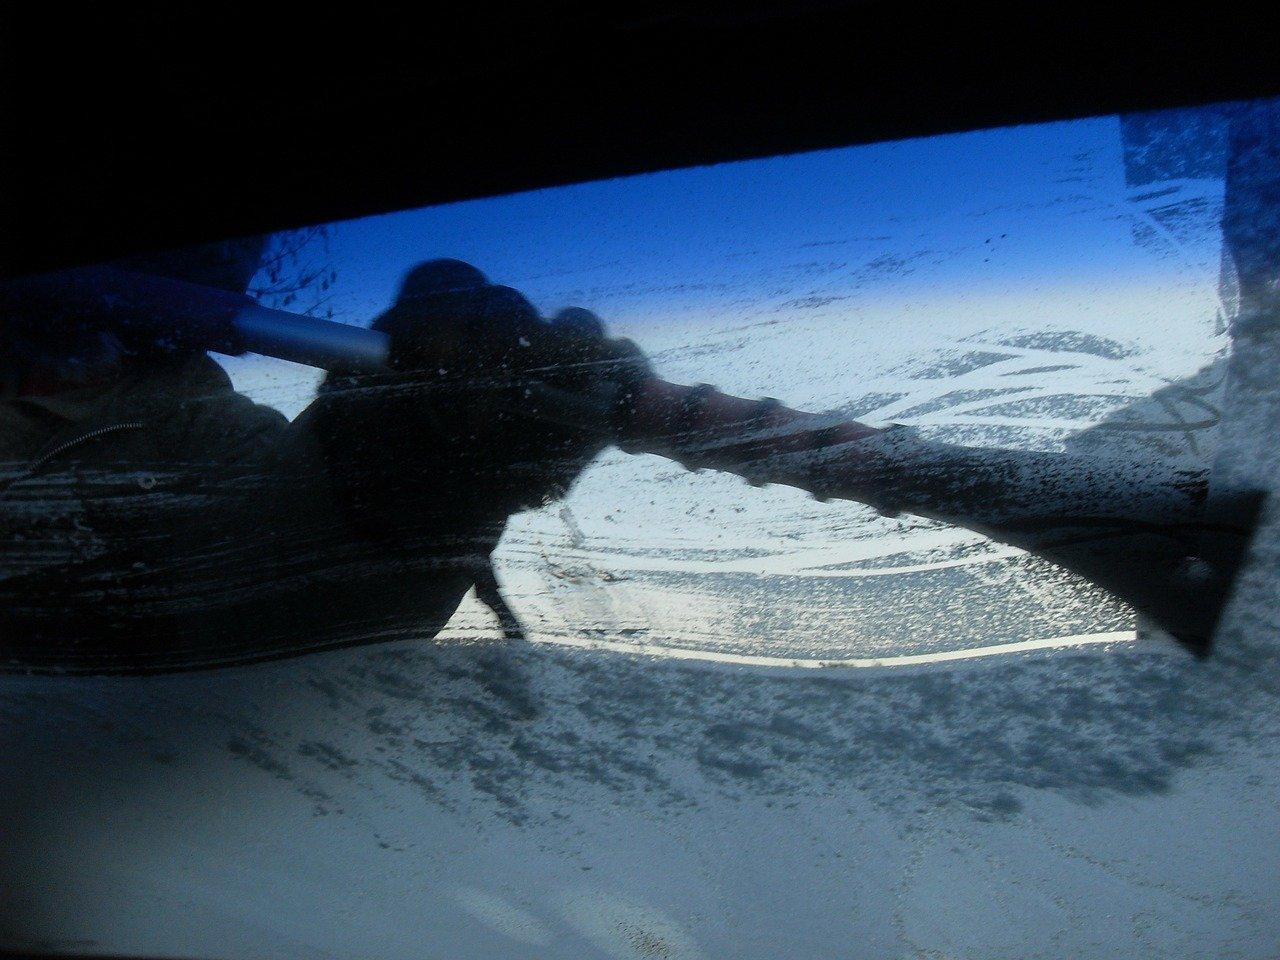 A man using a scarper and antifreeze on a frozen windscreen